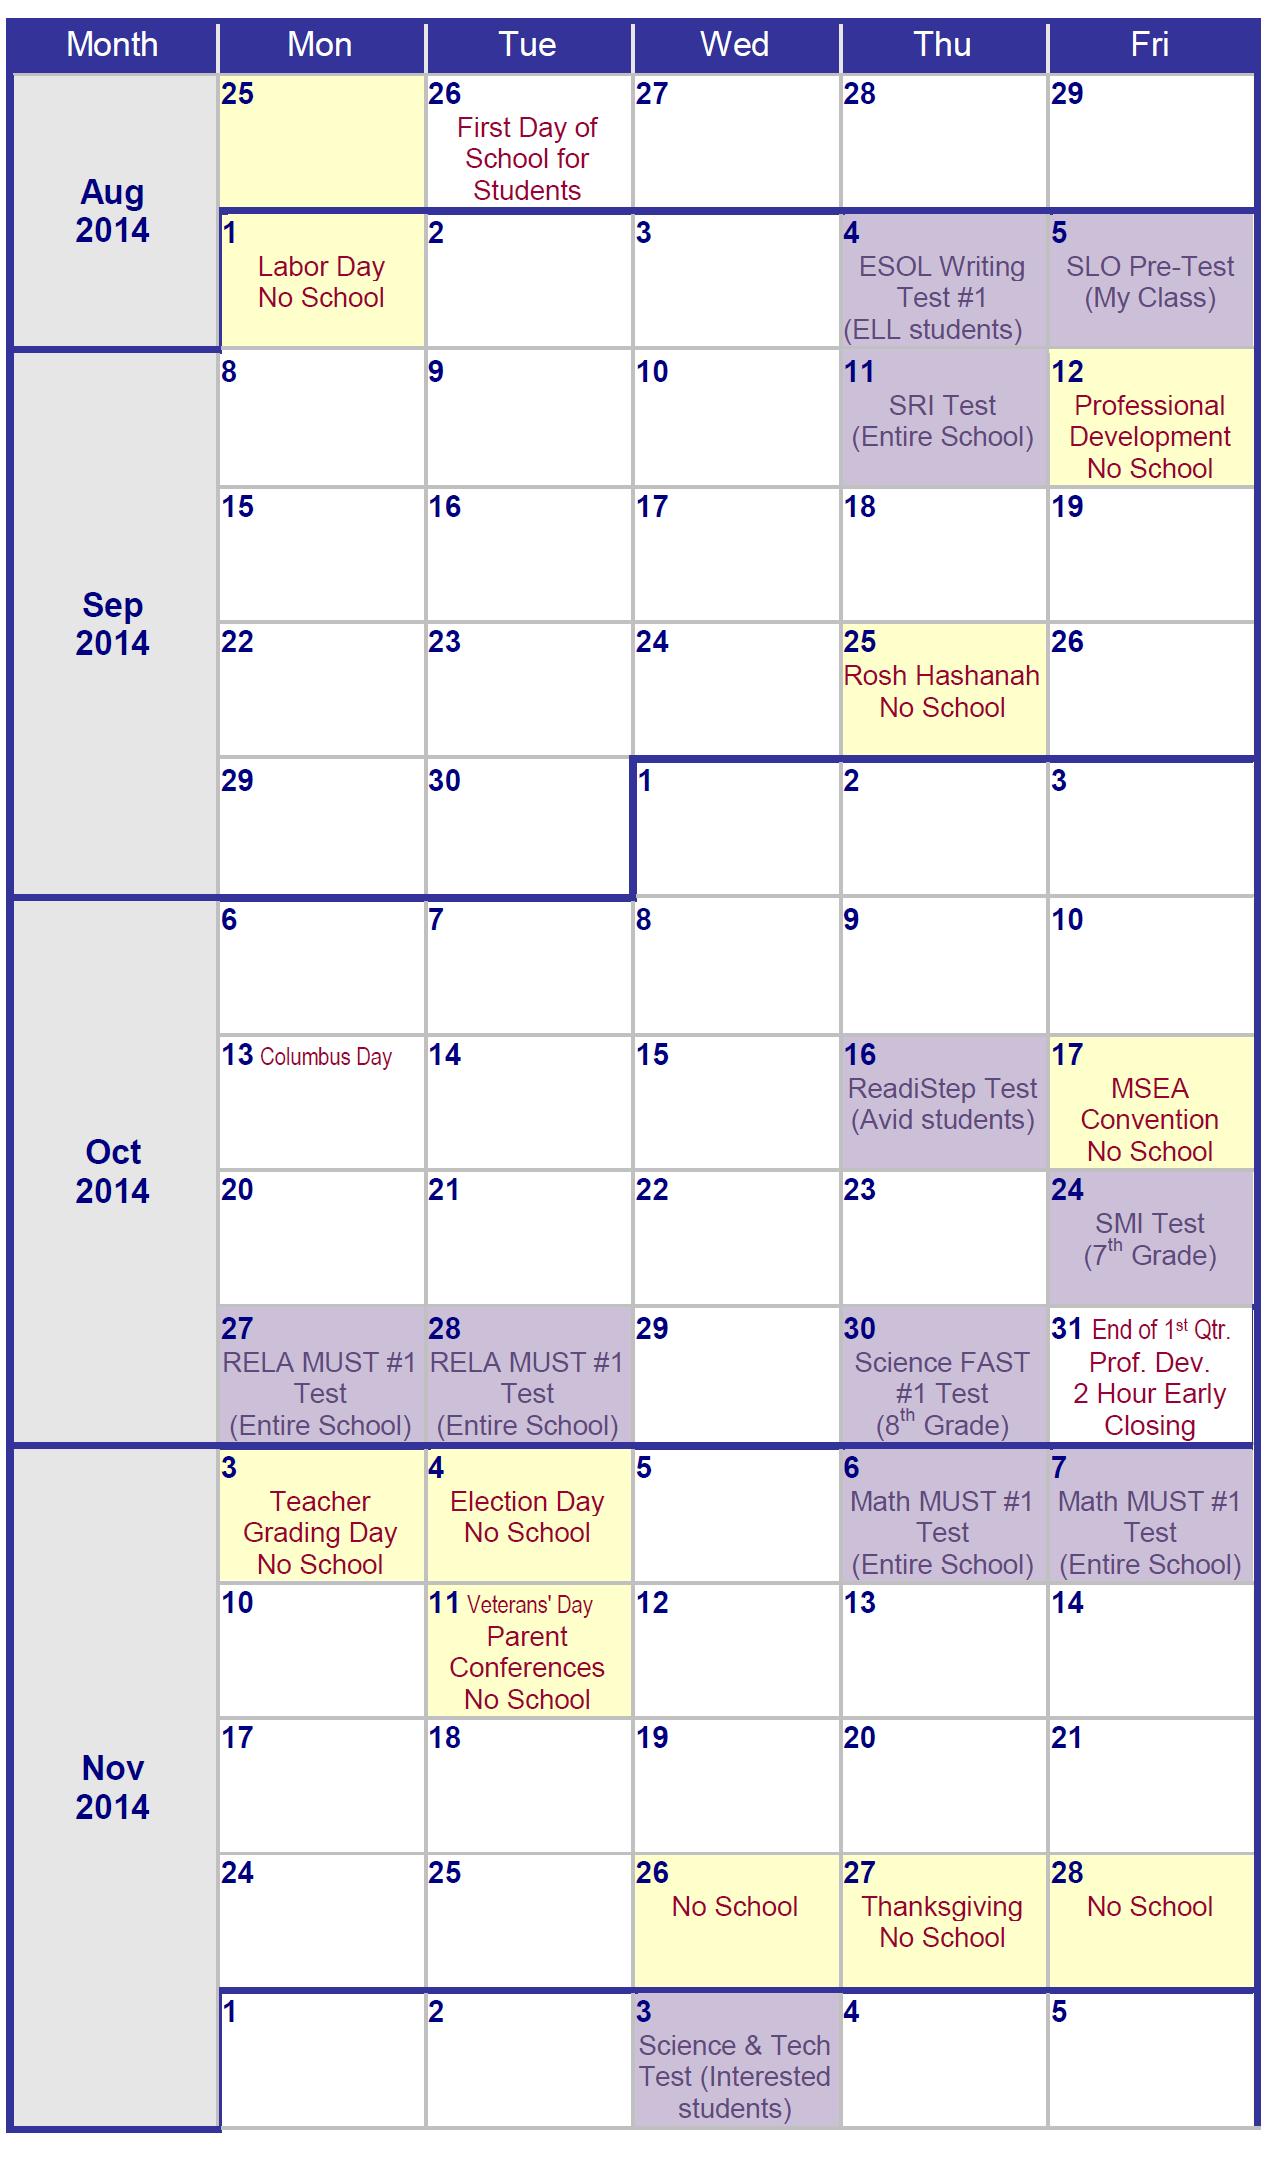 Pg County School Calendar One Local Middle School's Testing Calendar – Prince George's